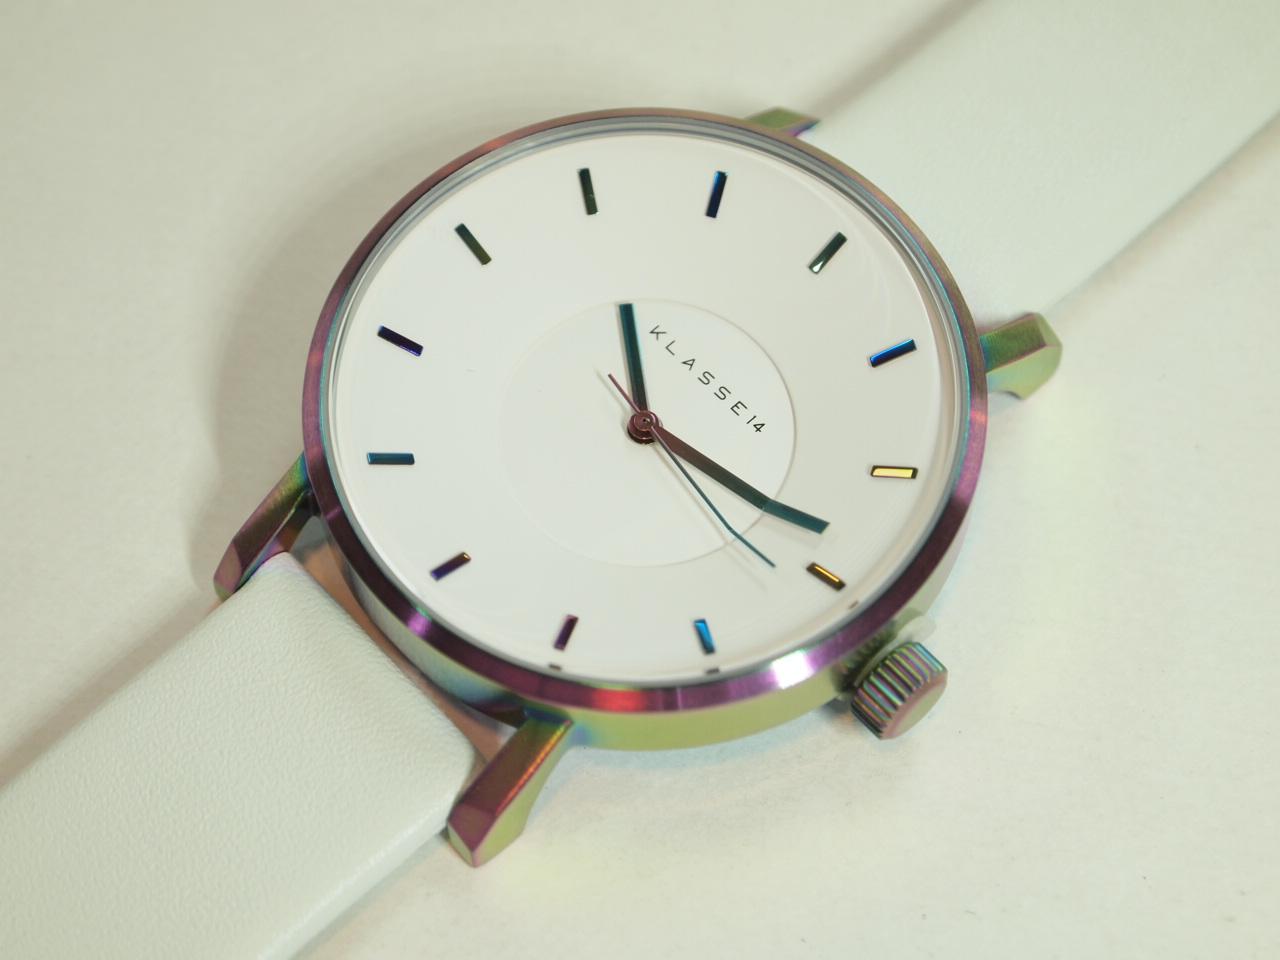 KLASSE14【クラス14】MARIO NOBILE Volare レインボー 42ミリ 人気の腕時計 クォーツウォッチ